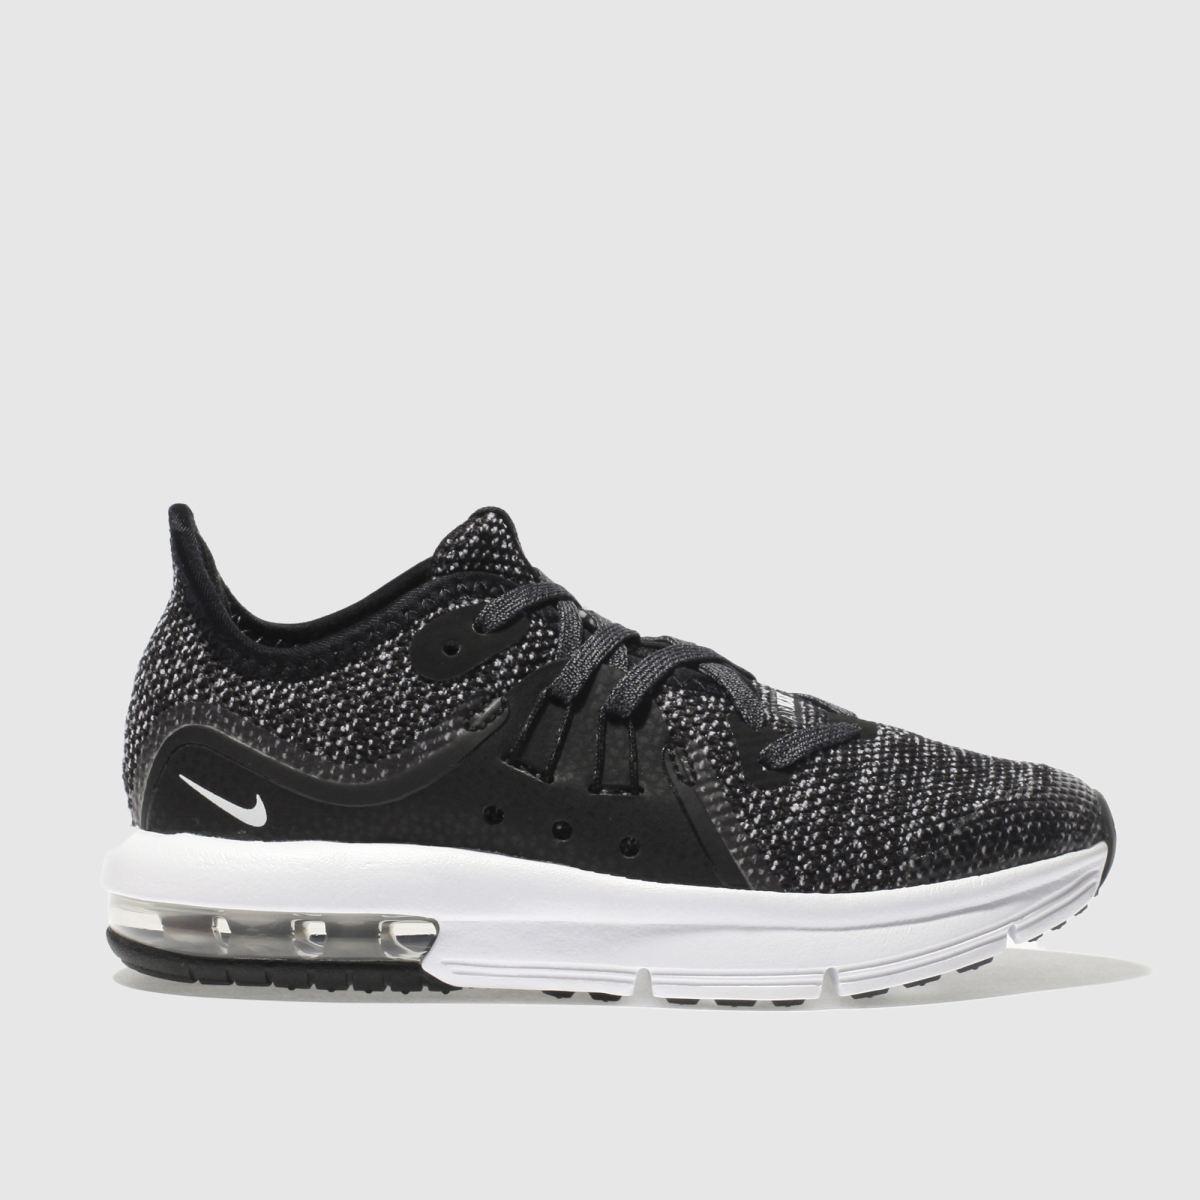 Nike Black & White Air Max Sequent 3 Junior Trainers